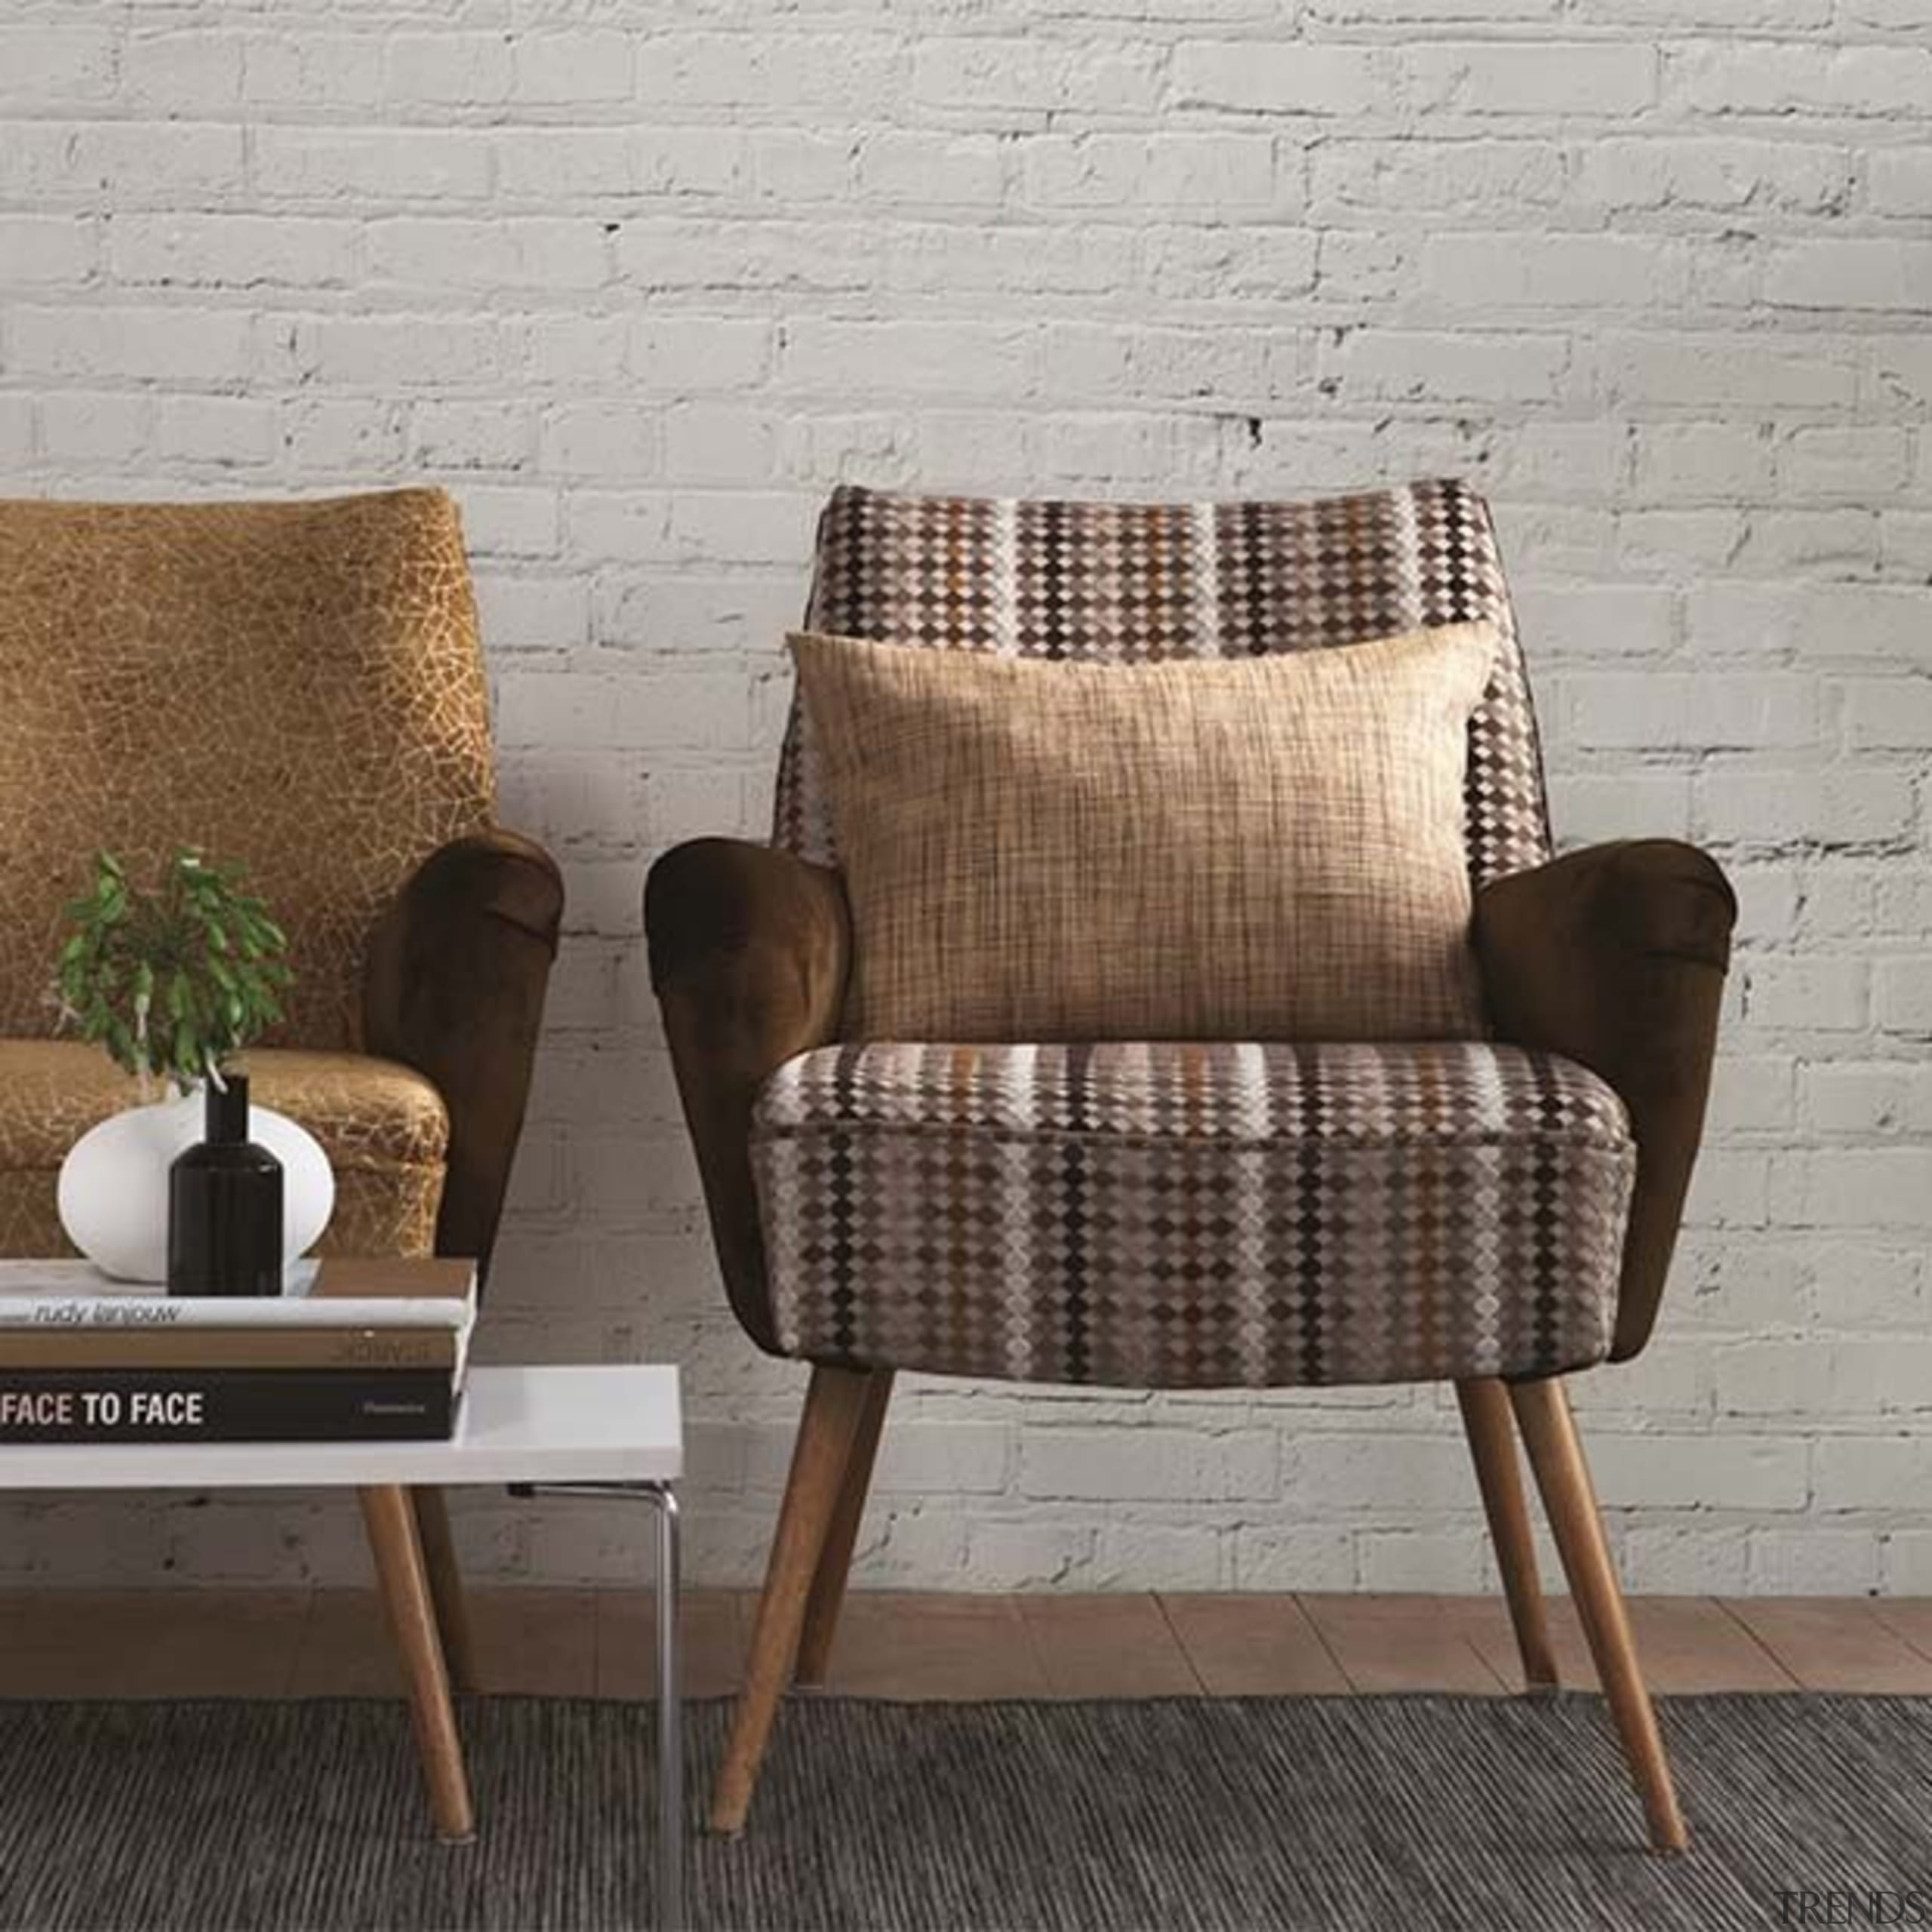 Kaleidoscope 6 - Kaleidoscope 6 - chair   chair, cushion, furniture, loveseat, product, wicker, wood, gray